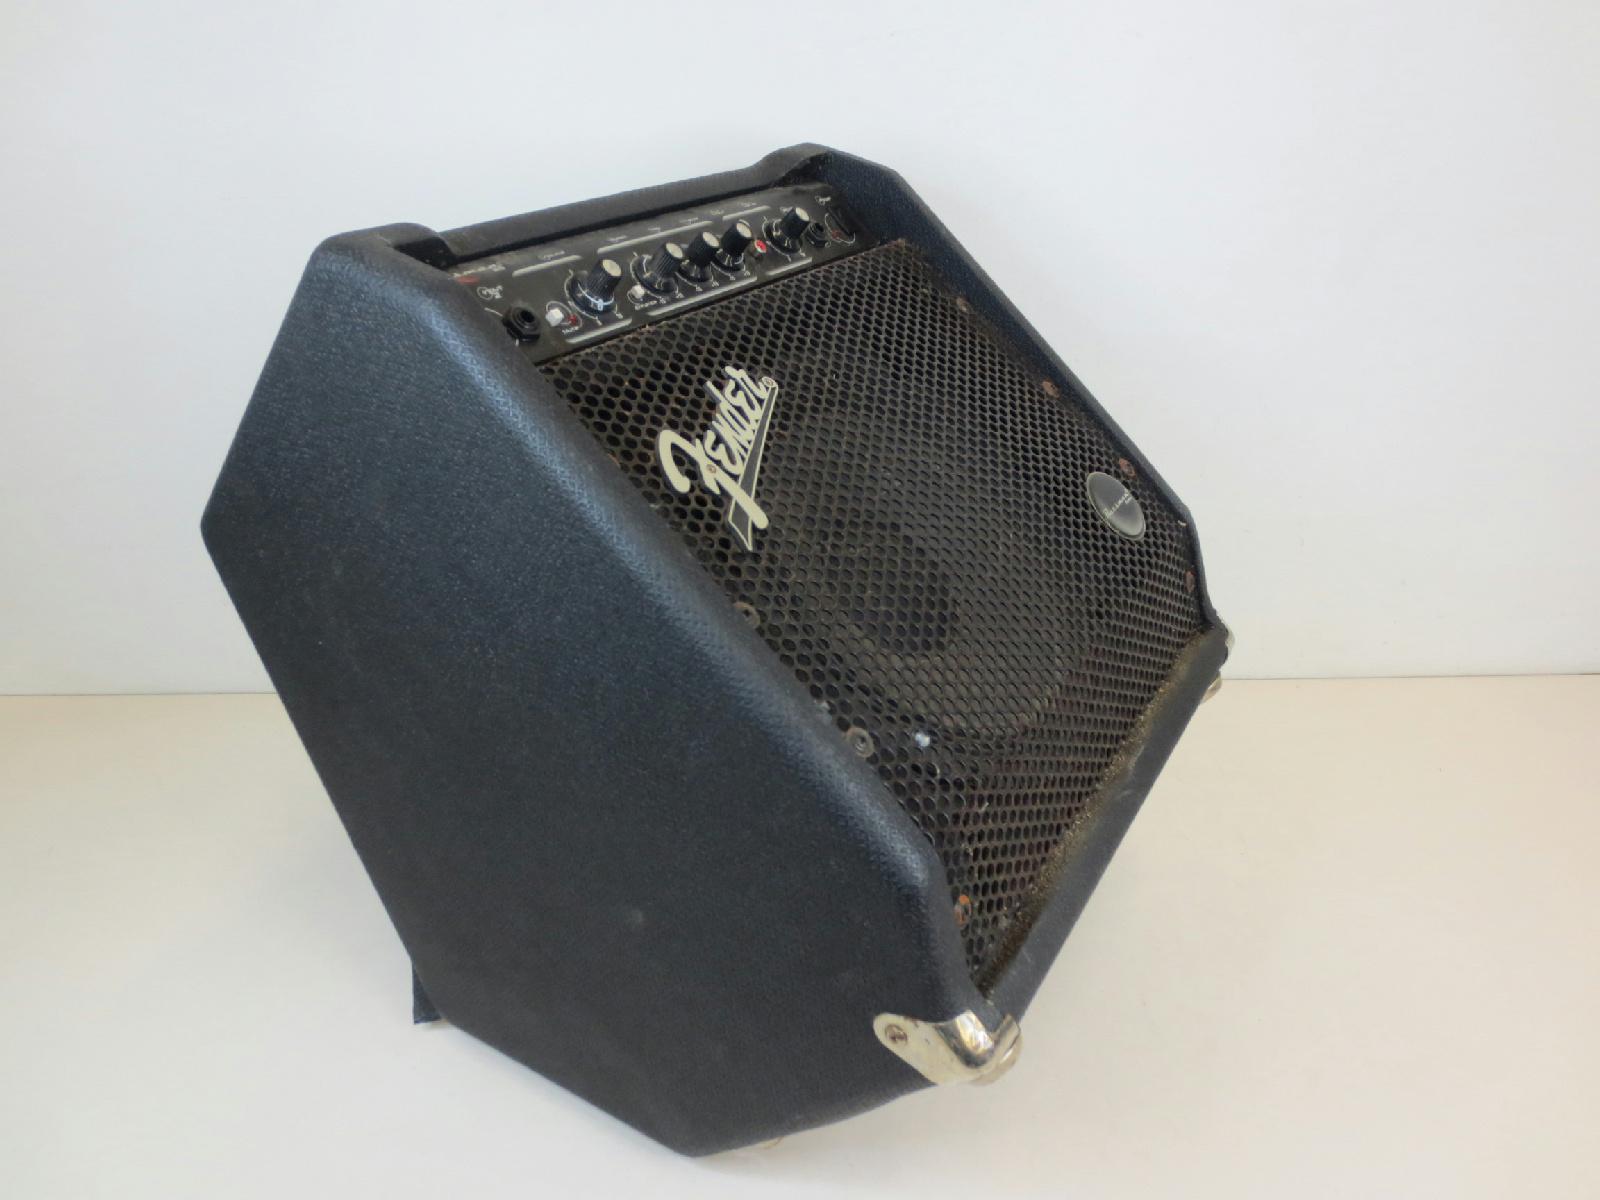 fender bassman 25 watt combo bass amp 10 speaker ebay. Black Bedroom Furniture Sets. Home Design Ideas